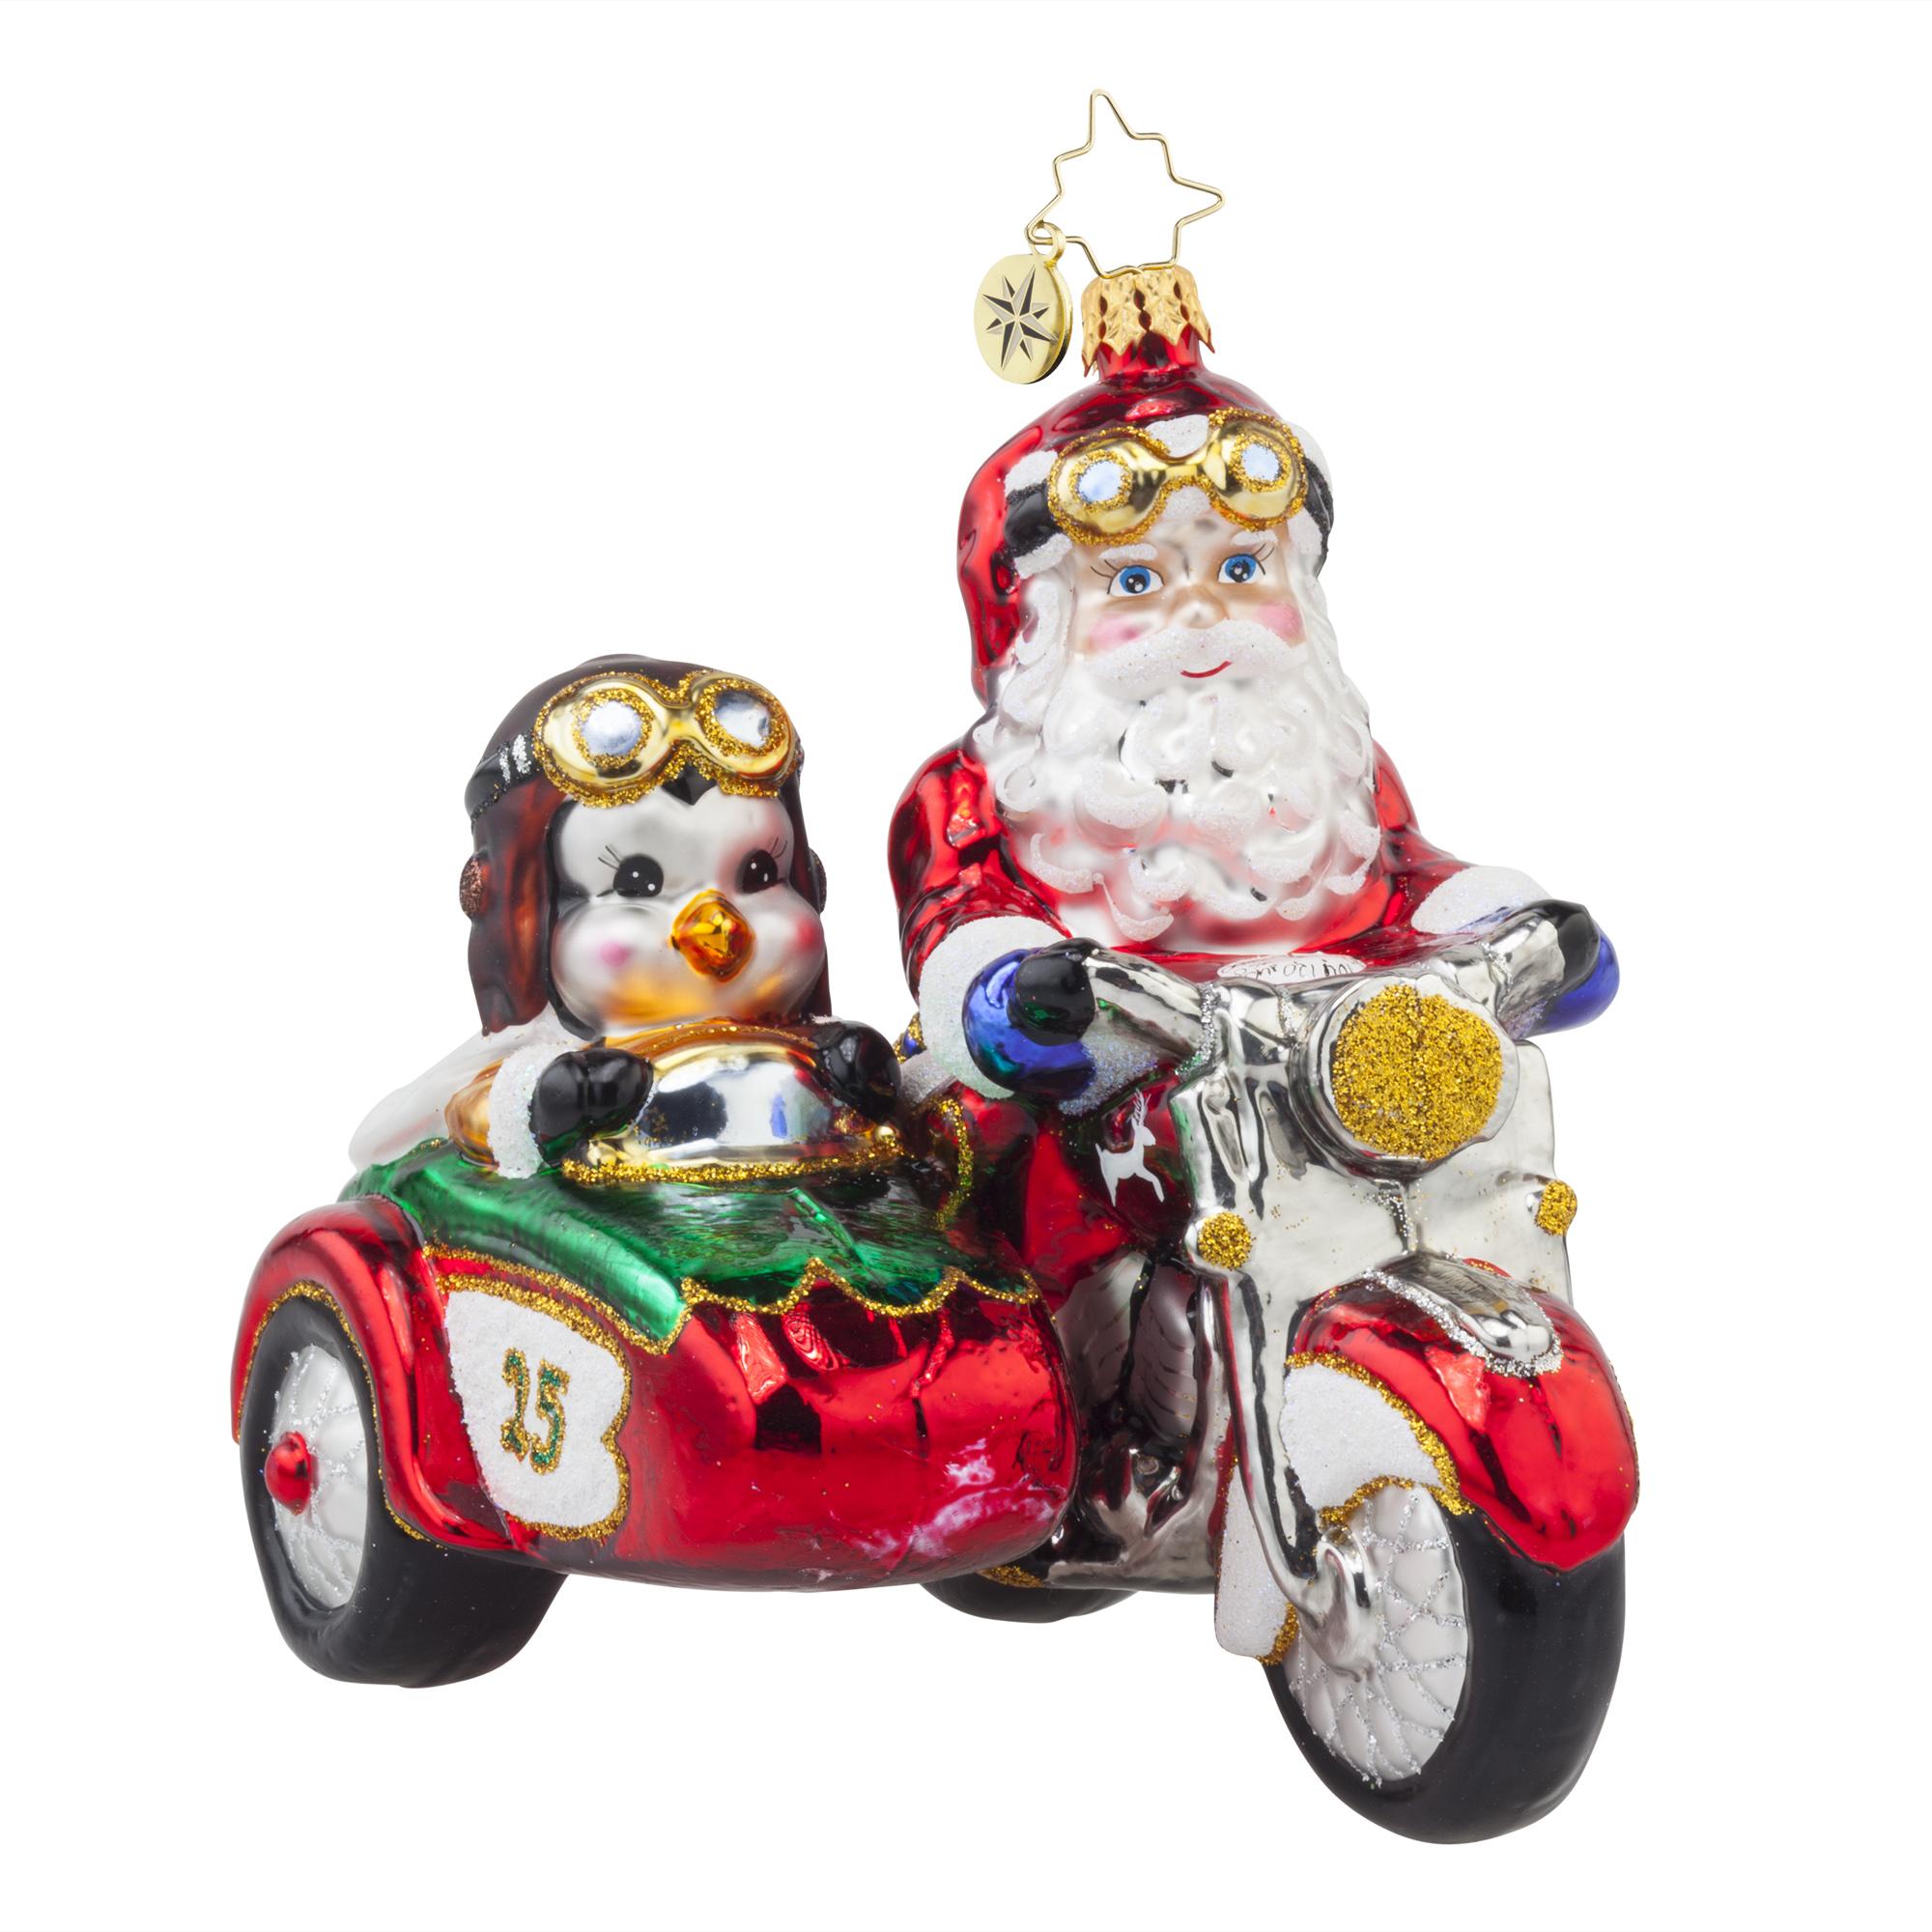 RADKO 1017663 MOTORCYCLE CHUMS - SANTA & PENGUIN RIDING A ...